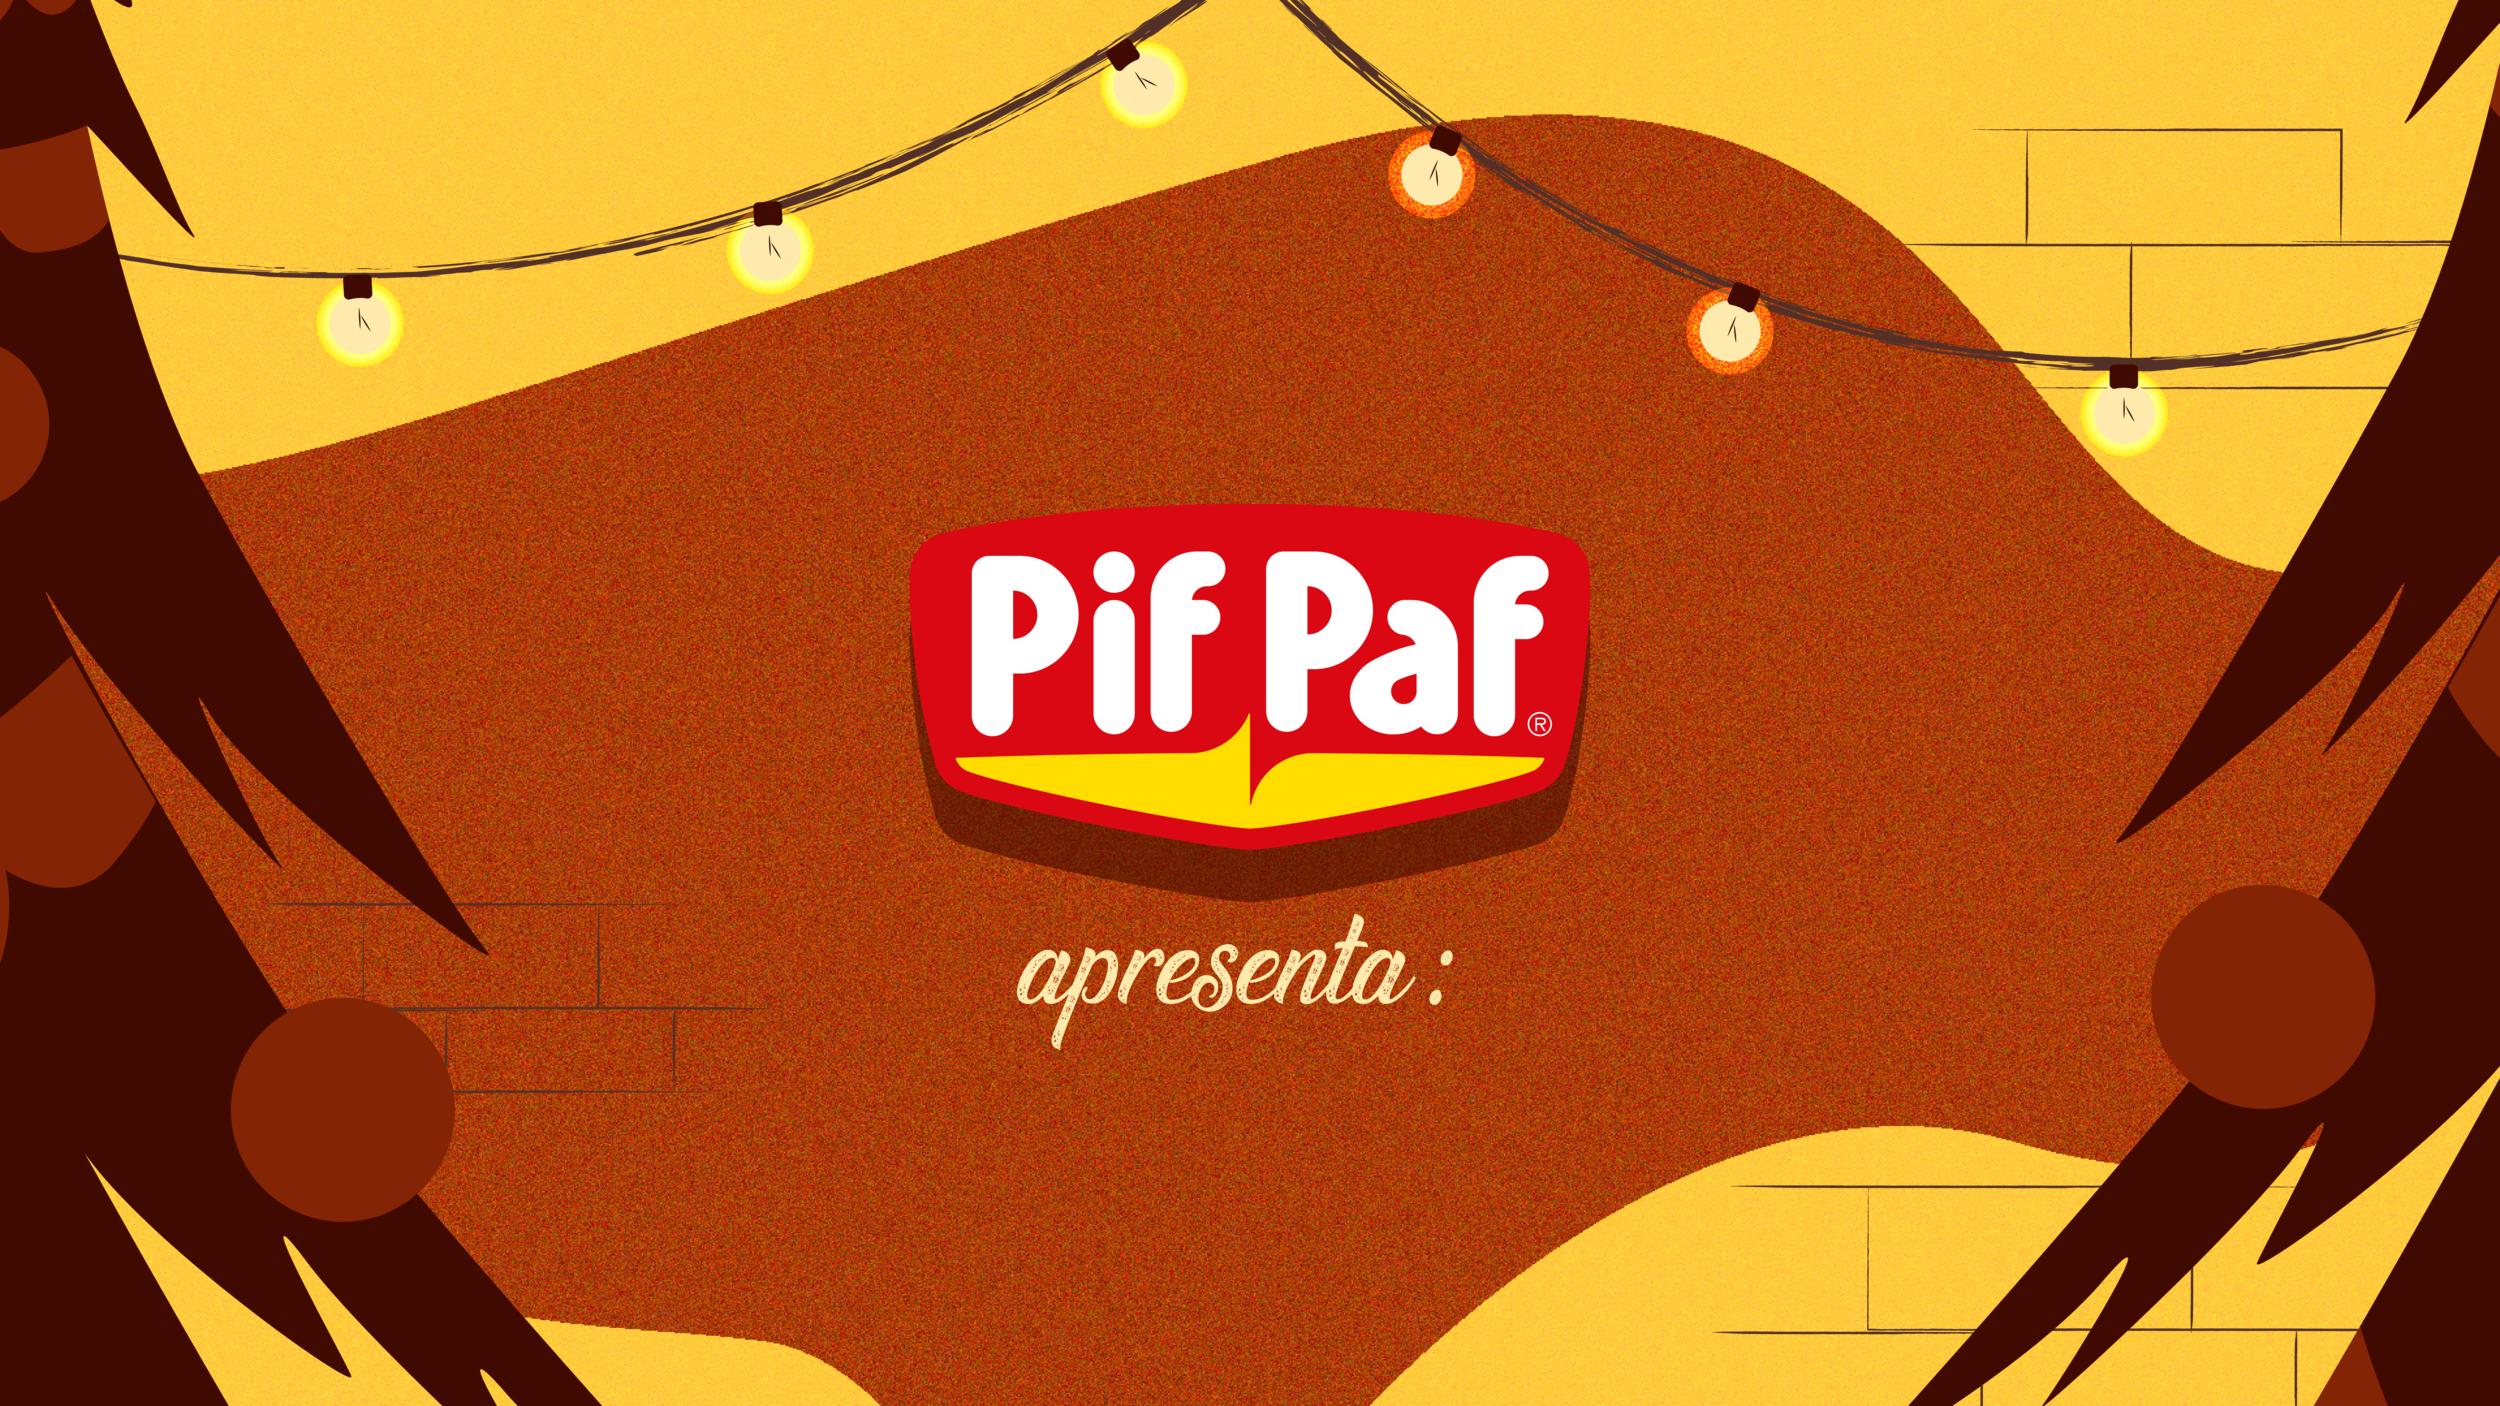 PifPaf-01.png